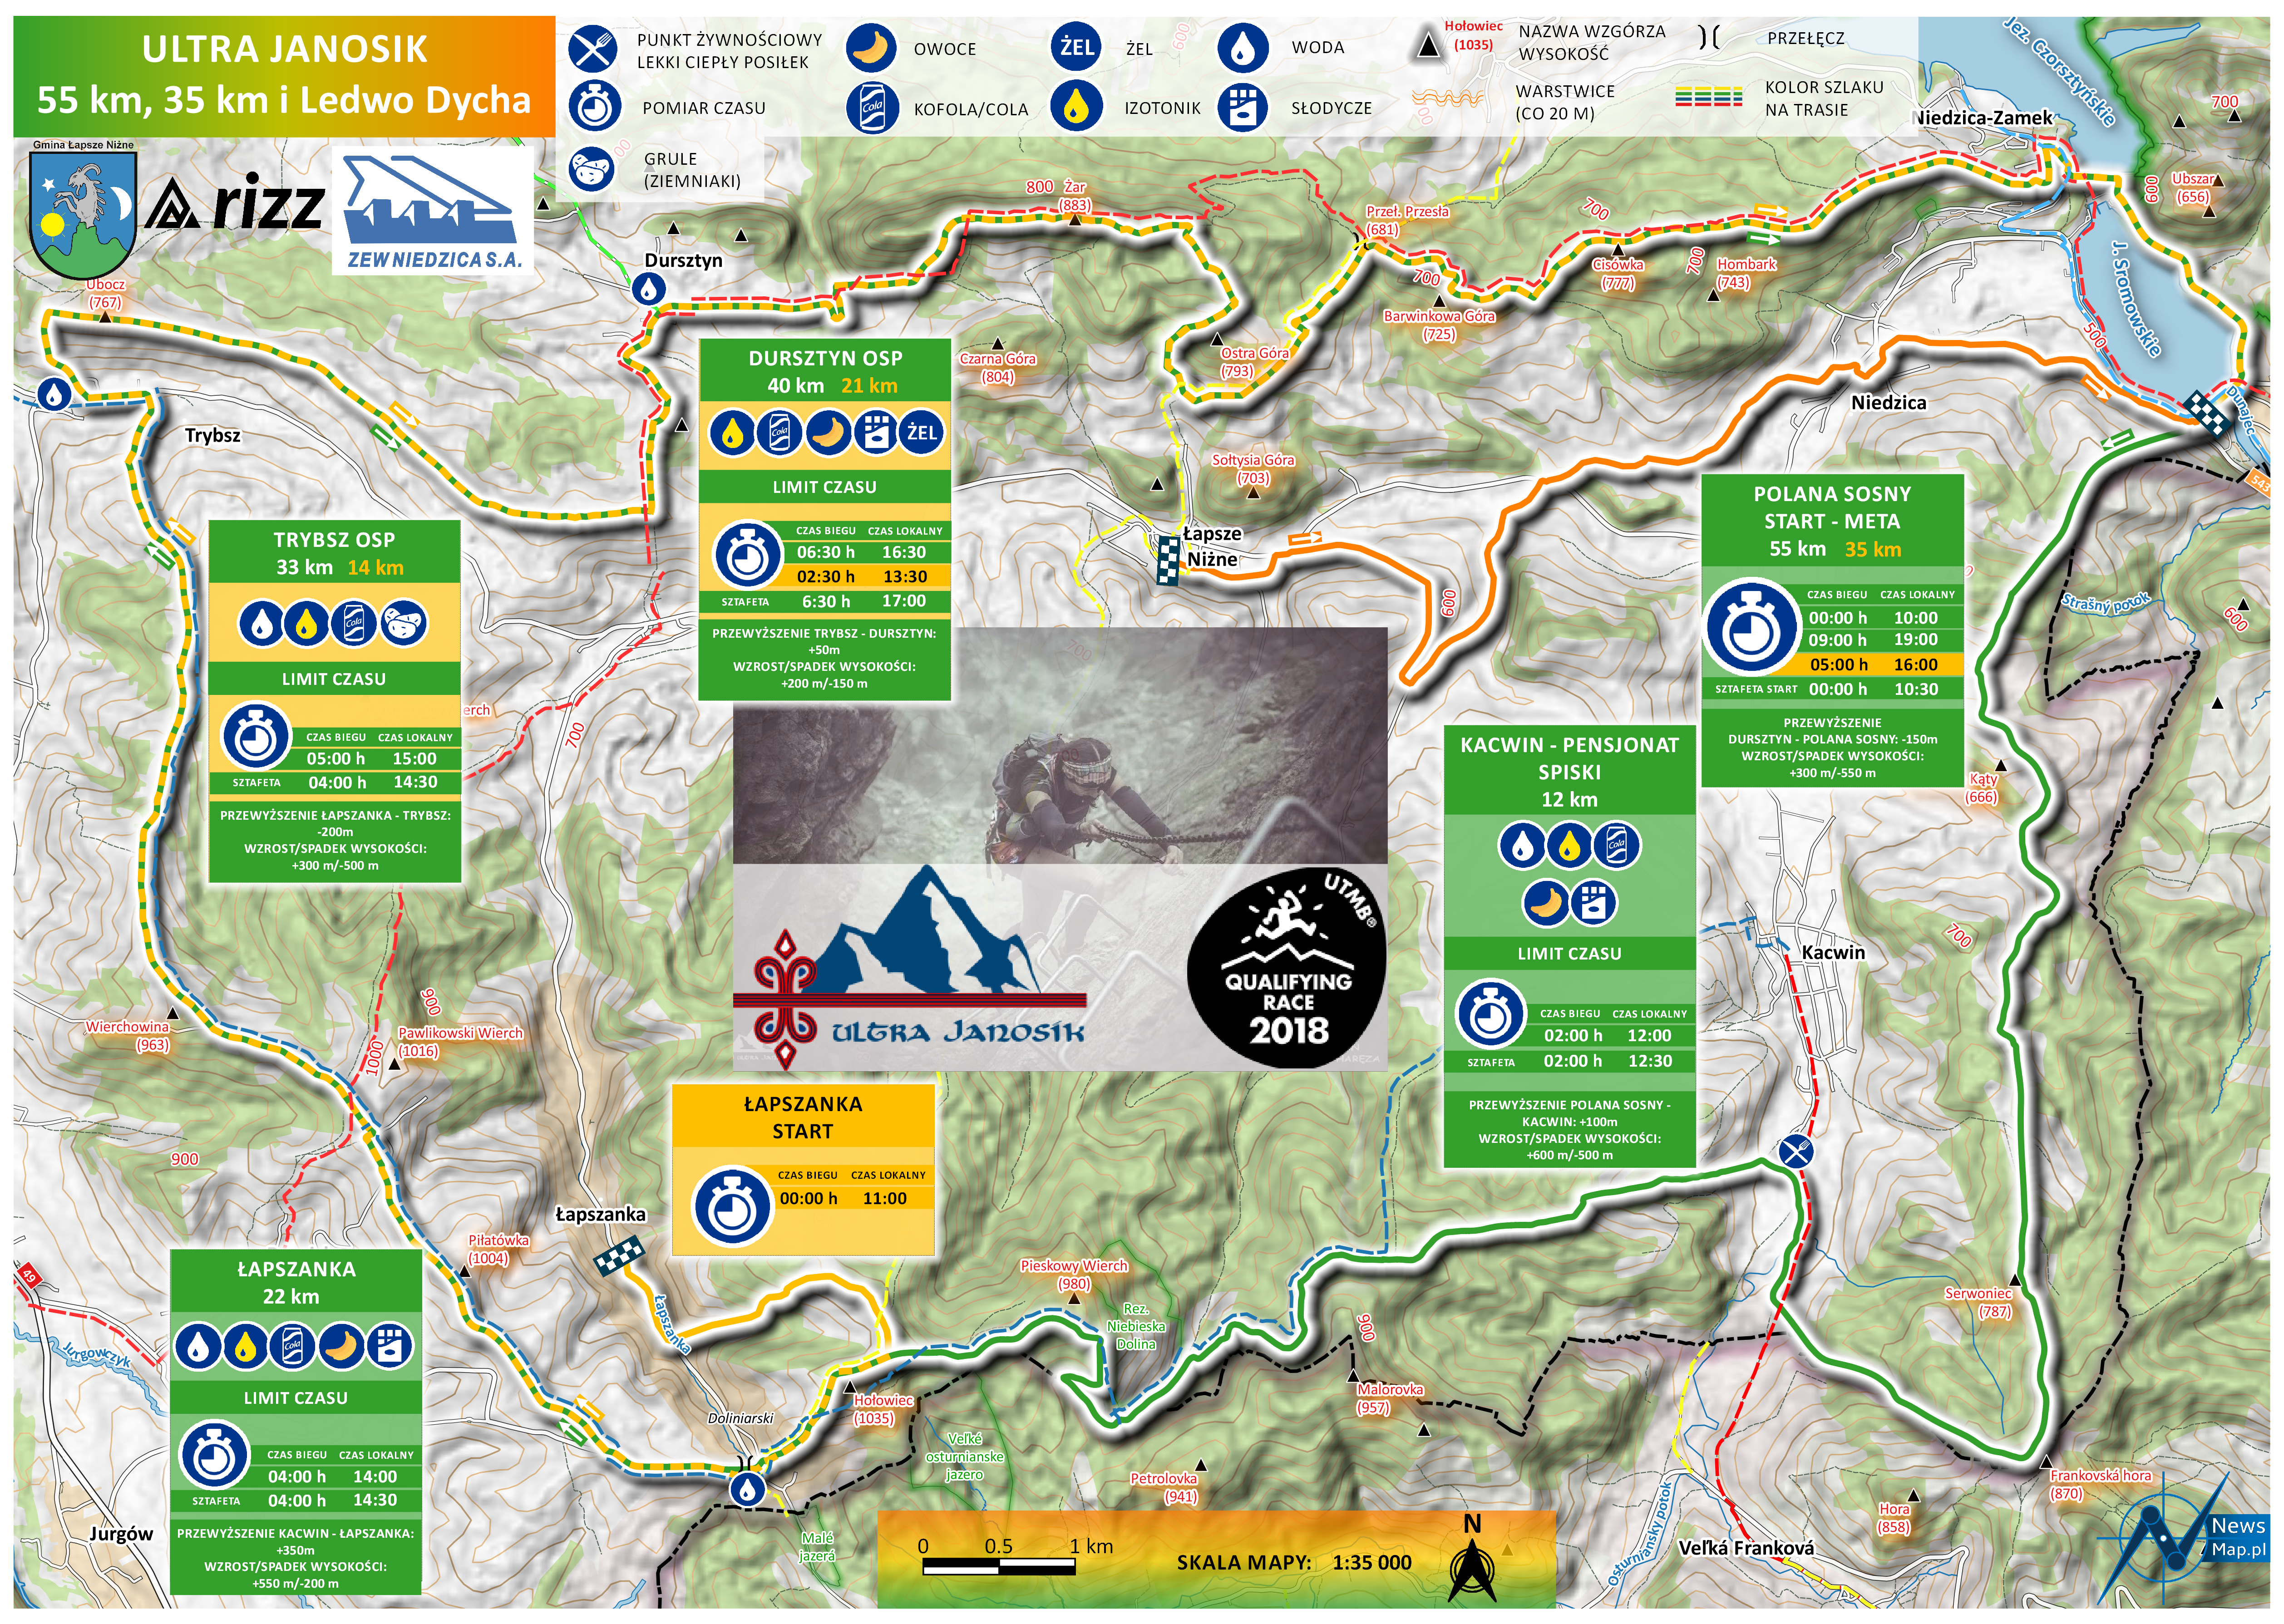 Ultra Janosik 55, 35 km i Ledwo Dycha (mapa statyczna on-line)